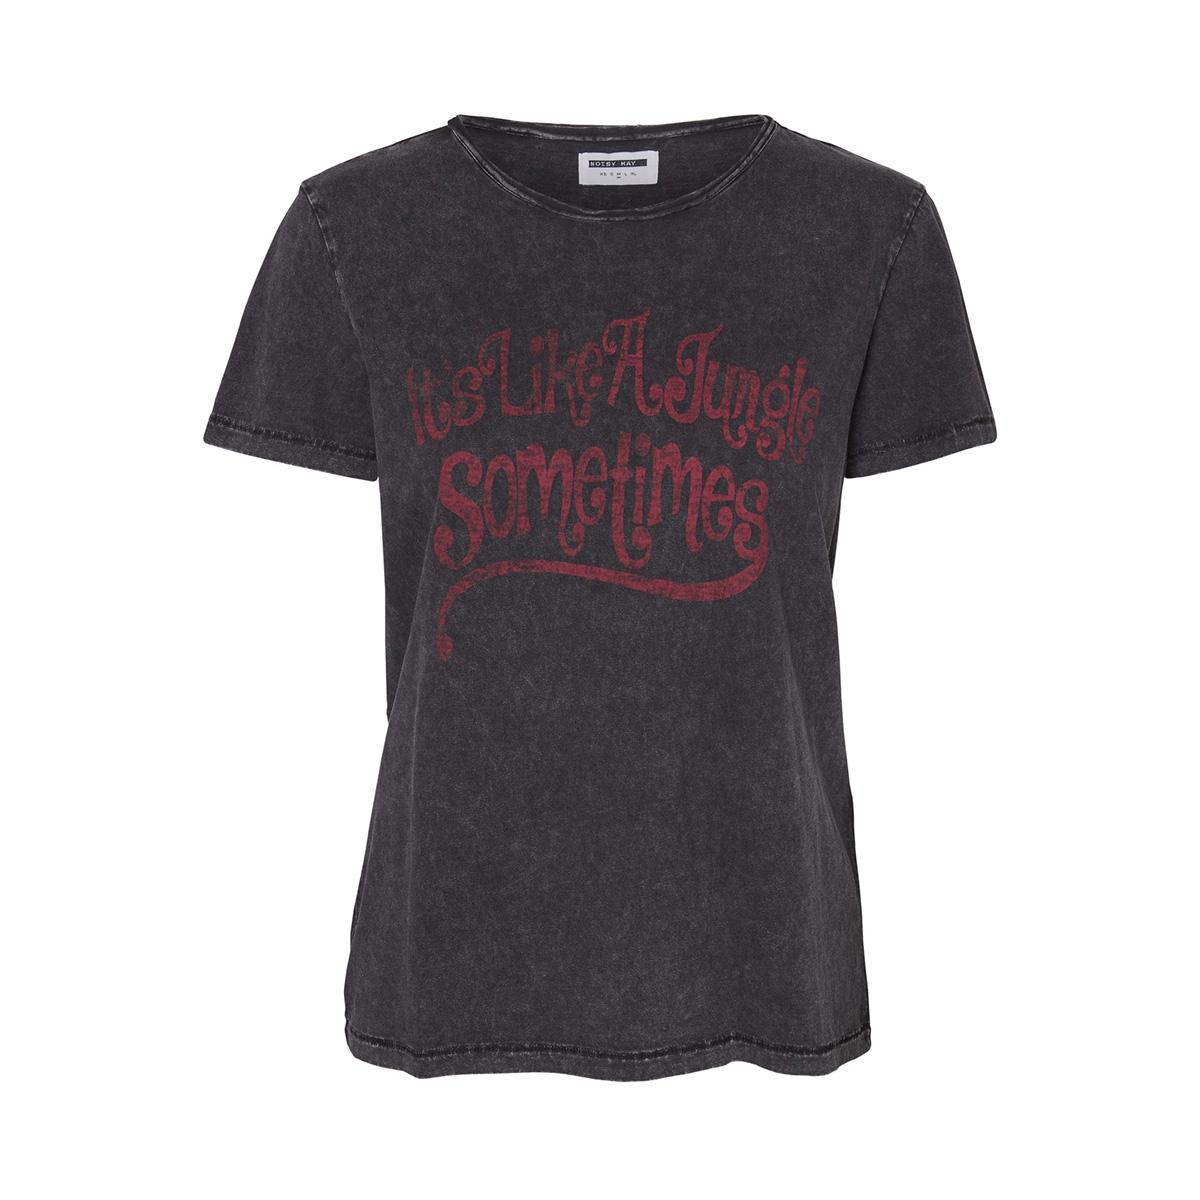 nmnavita s/s top box vintage 3 bg 27006756 noisy may t-shirt black/it's a jungle